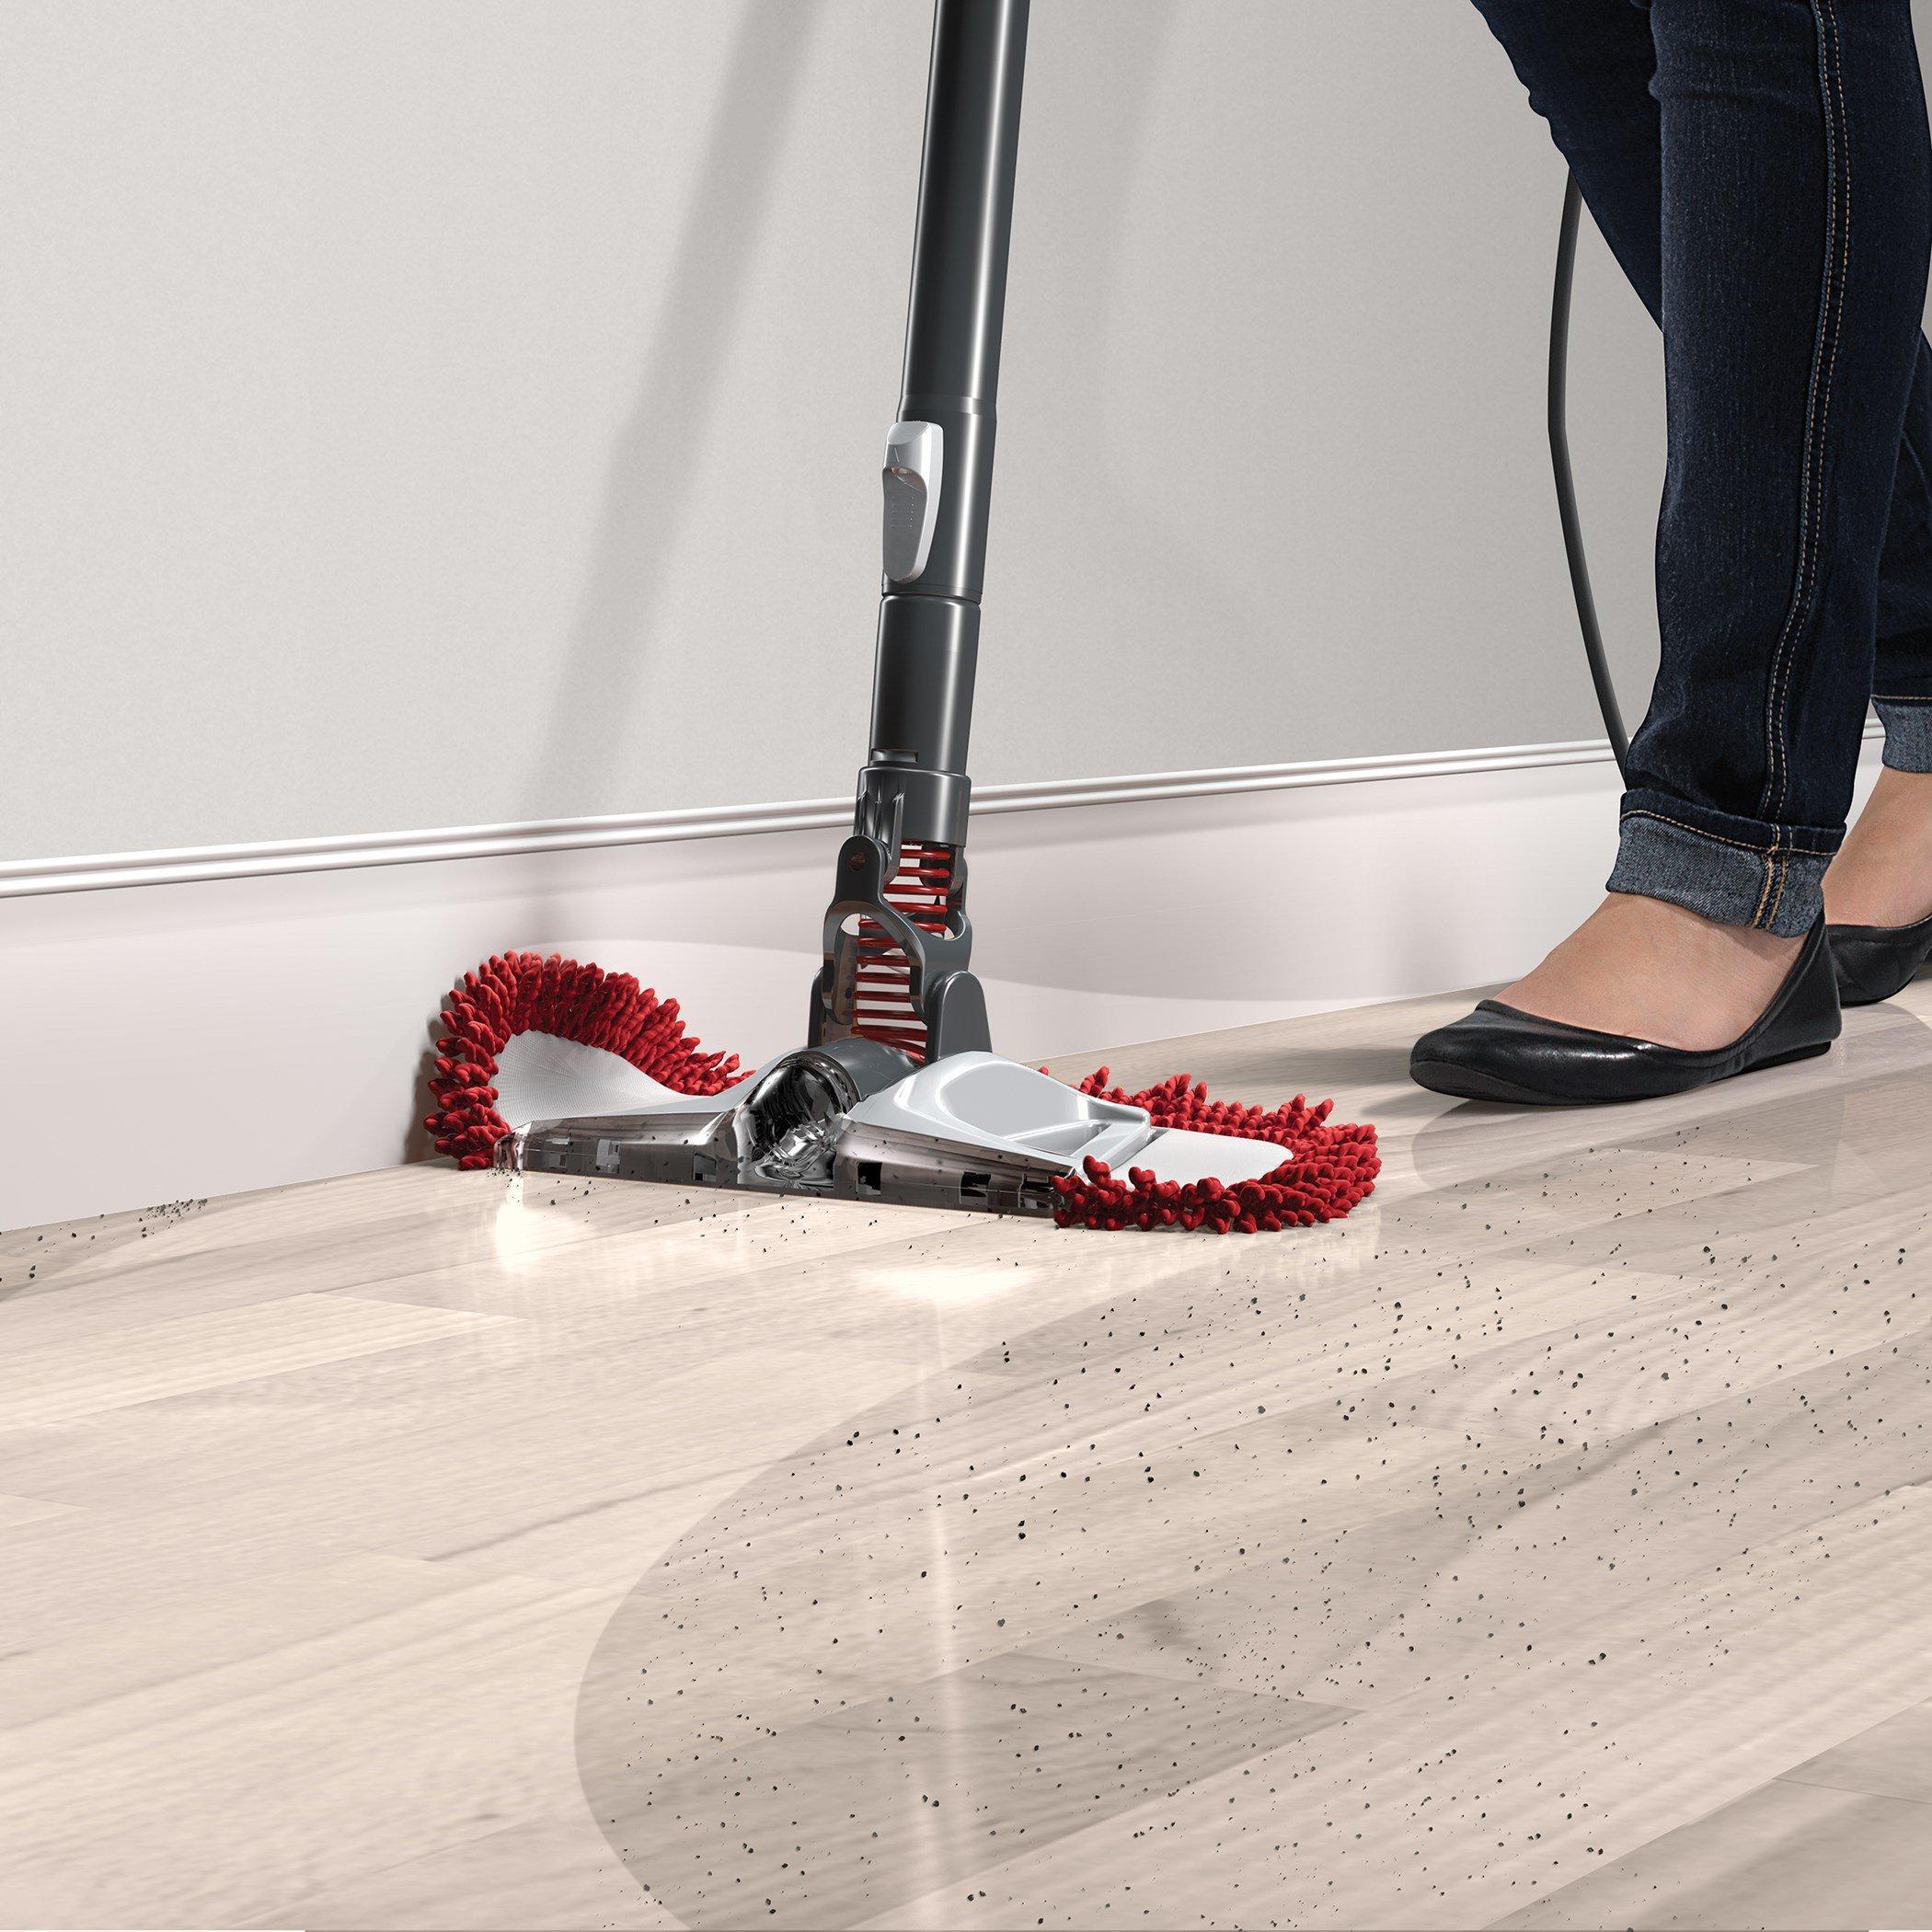 Reconditioned 360 Reach Pro Bagless Stick Vacuum6